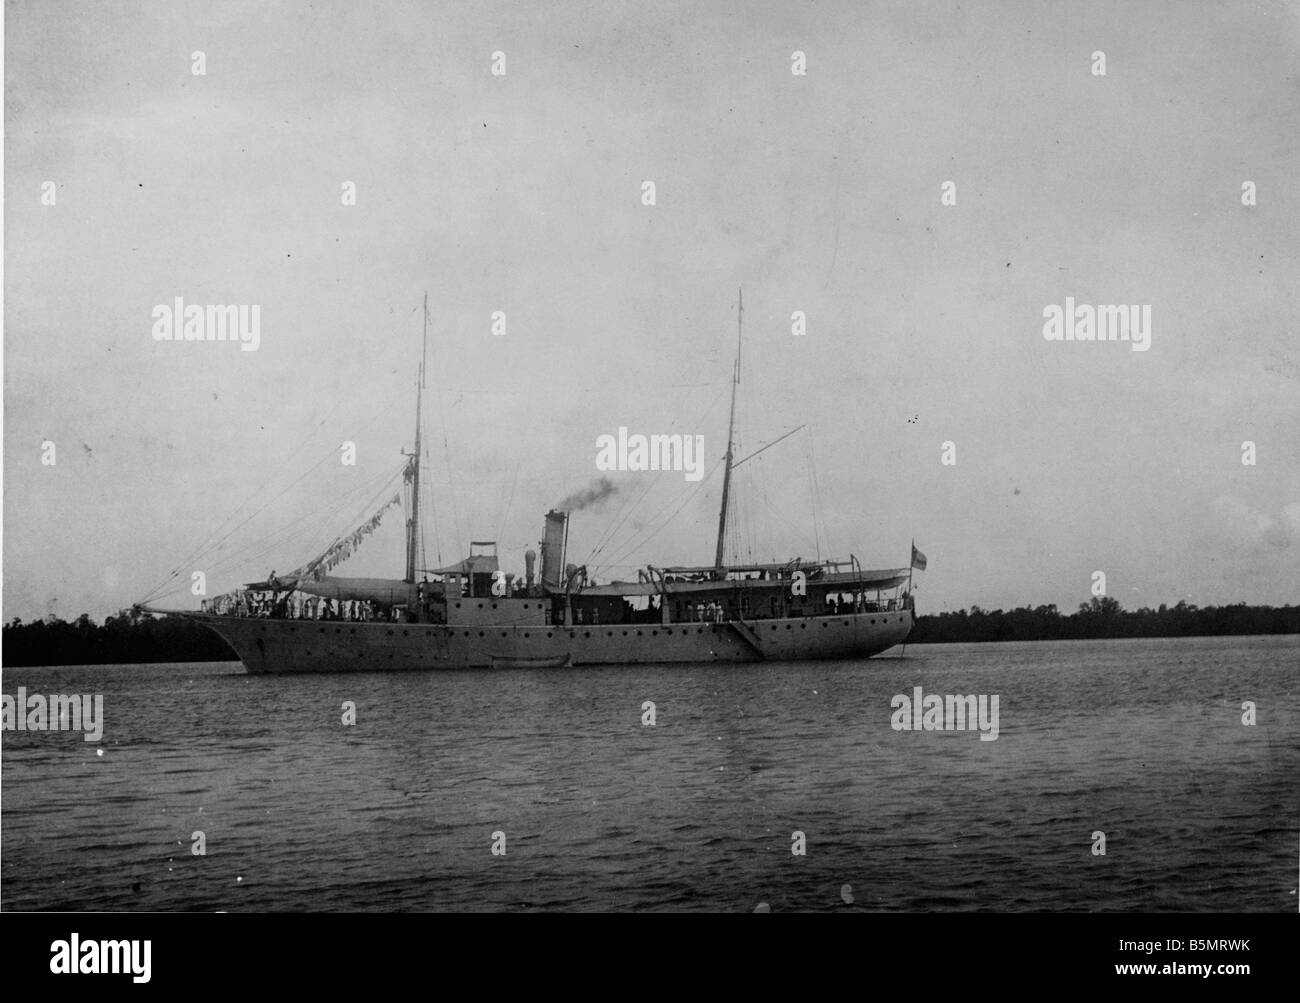 S M S Moewe im Rufidji Foto Deutsch-Ostafrika heute Tansania als deutsche Kolonie 1884 1920 S M S Moewe Rufidji Foto 1914 Stockfoto